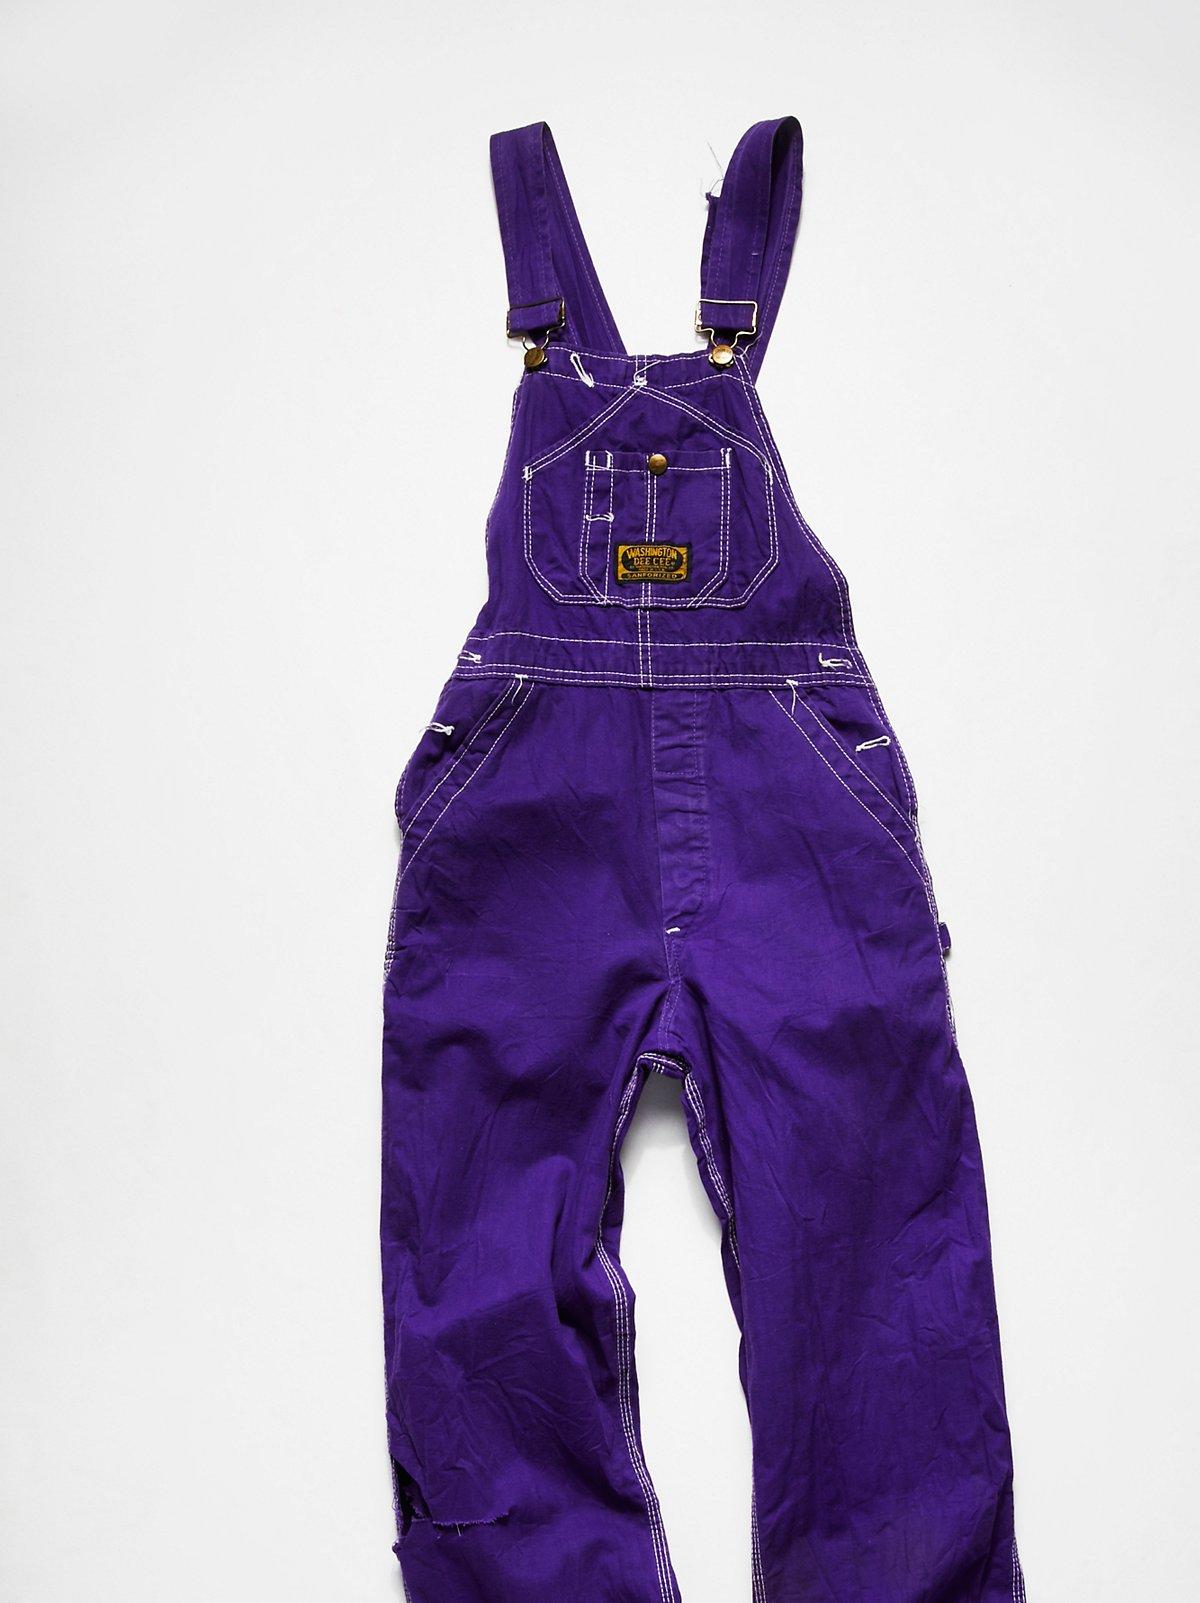 Vintage 1980s Purple Denim Overalls